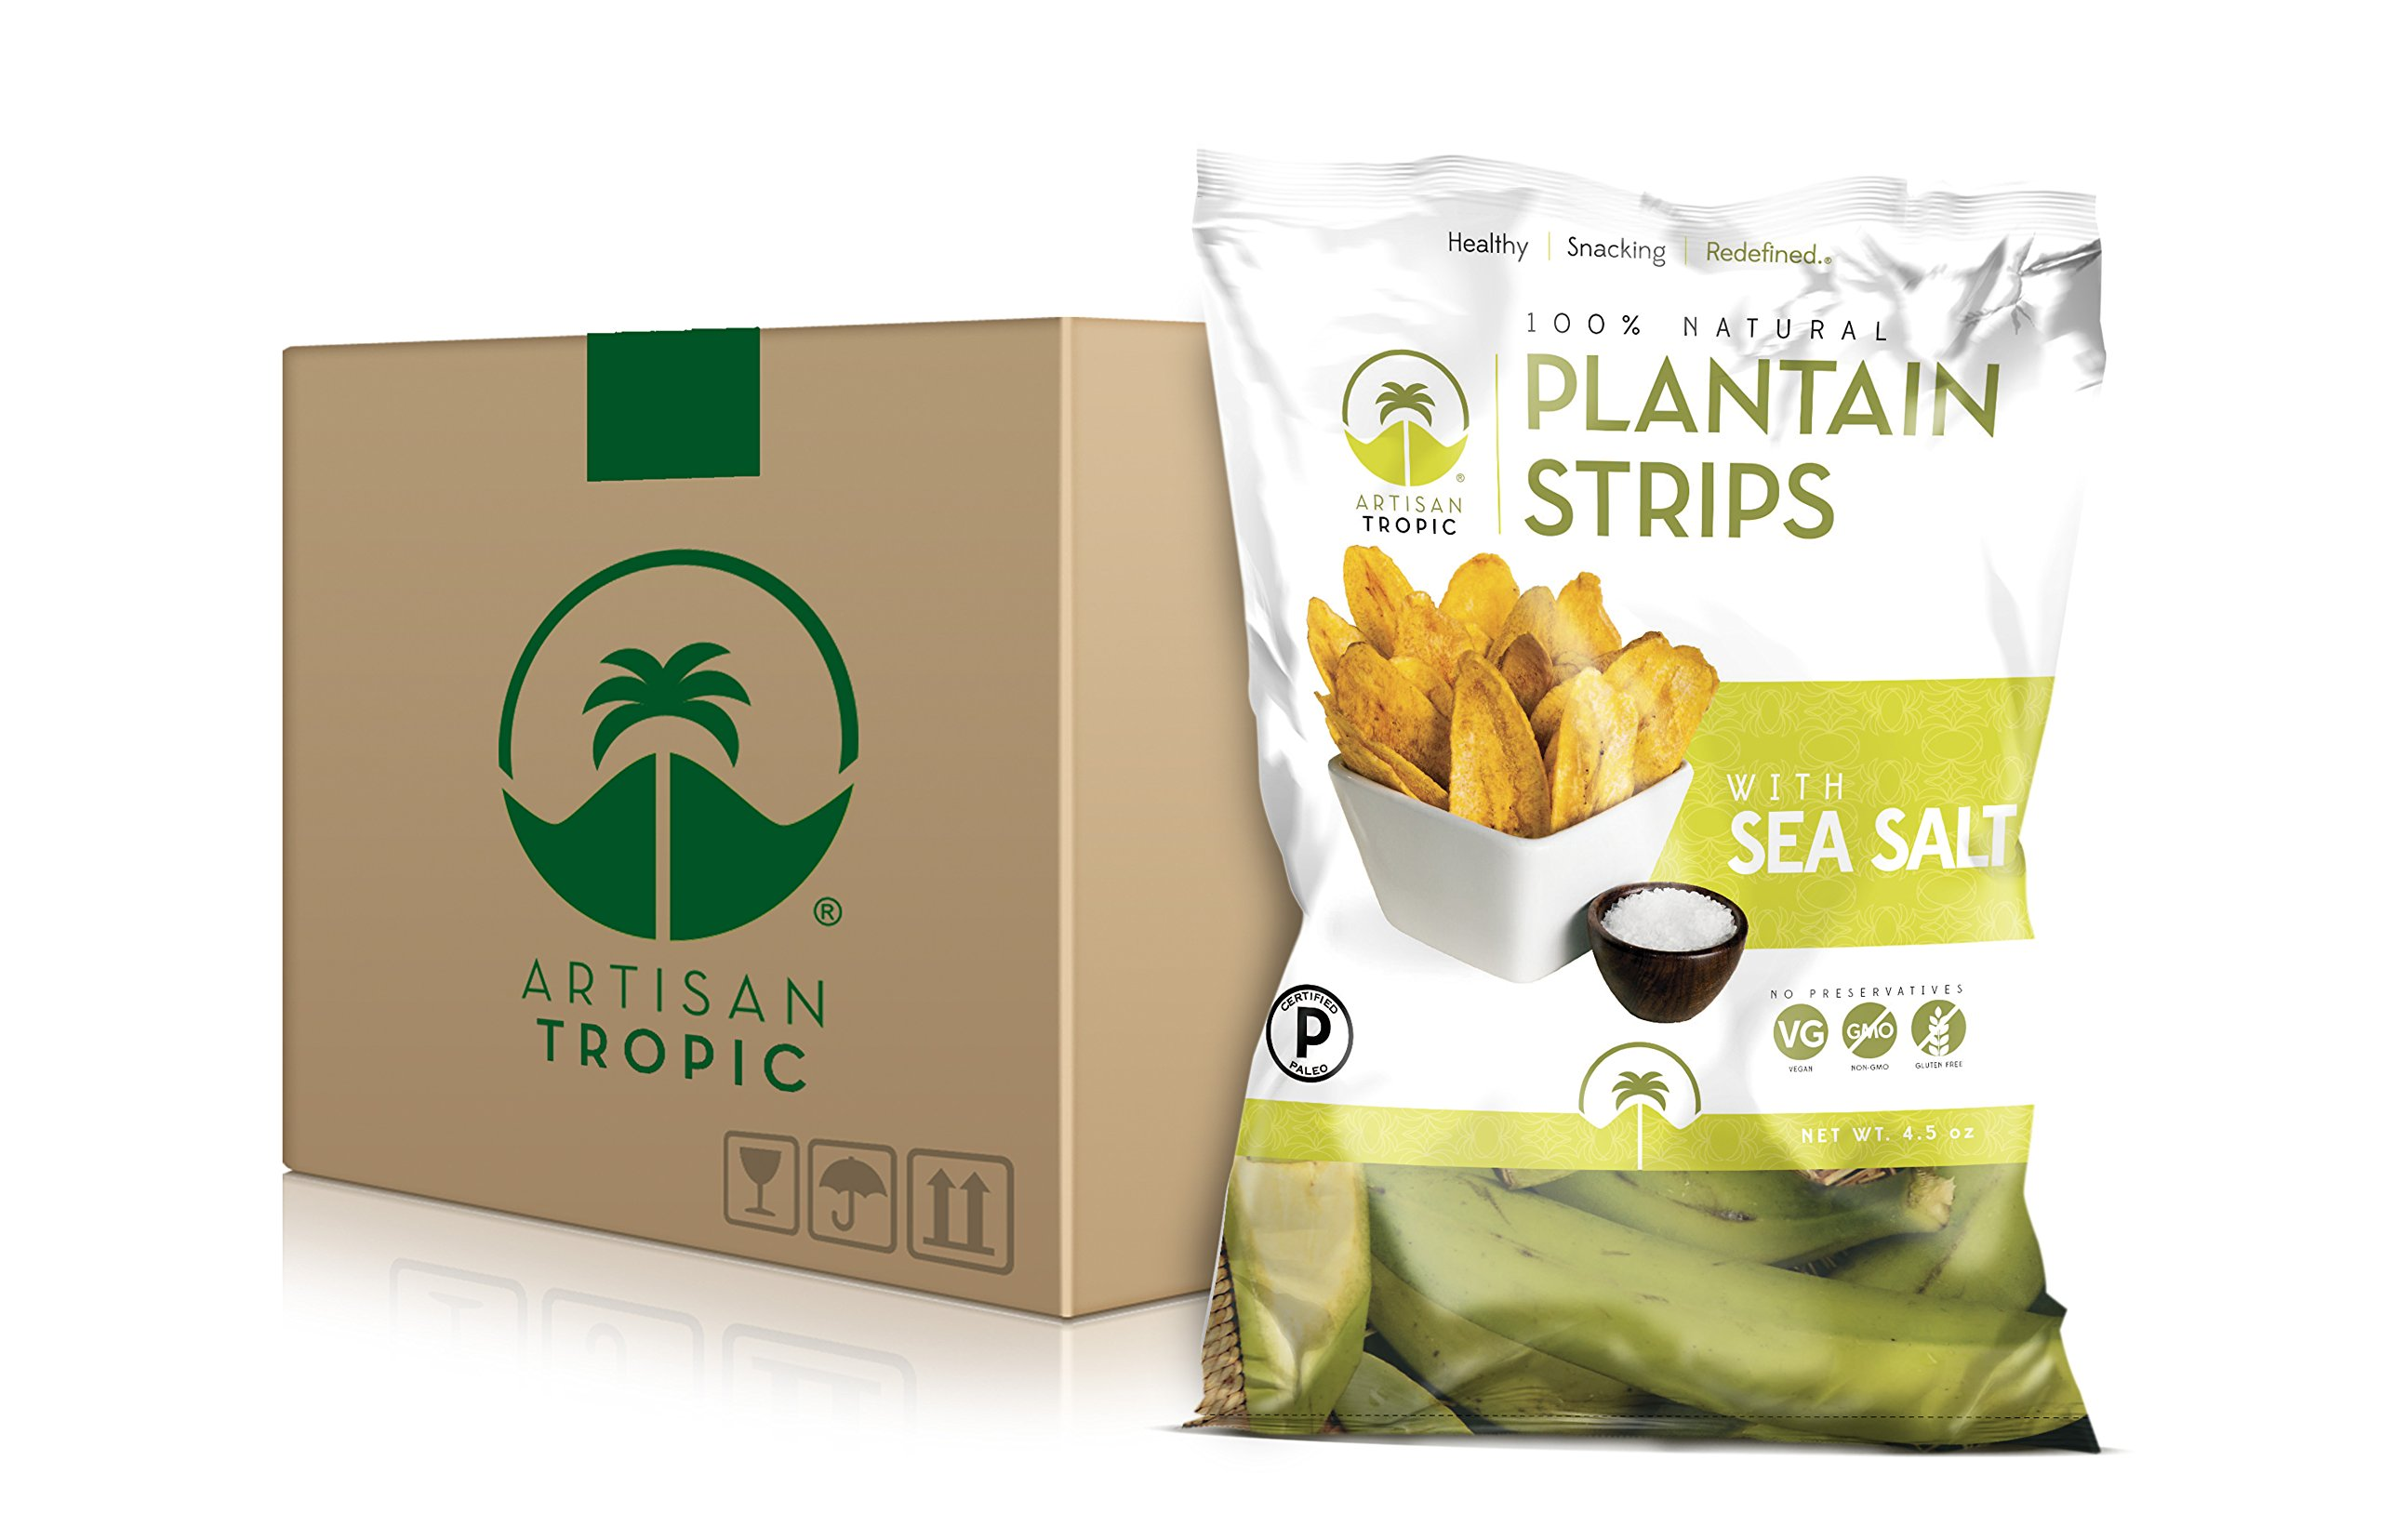 Artisan Tropic Plantain Strips: Sea Salt 4.5oz (12 Pack) by Artisan Tropic